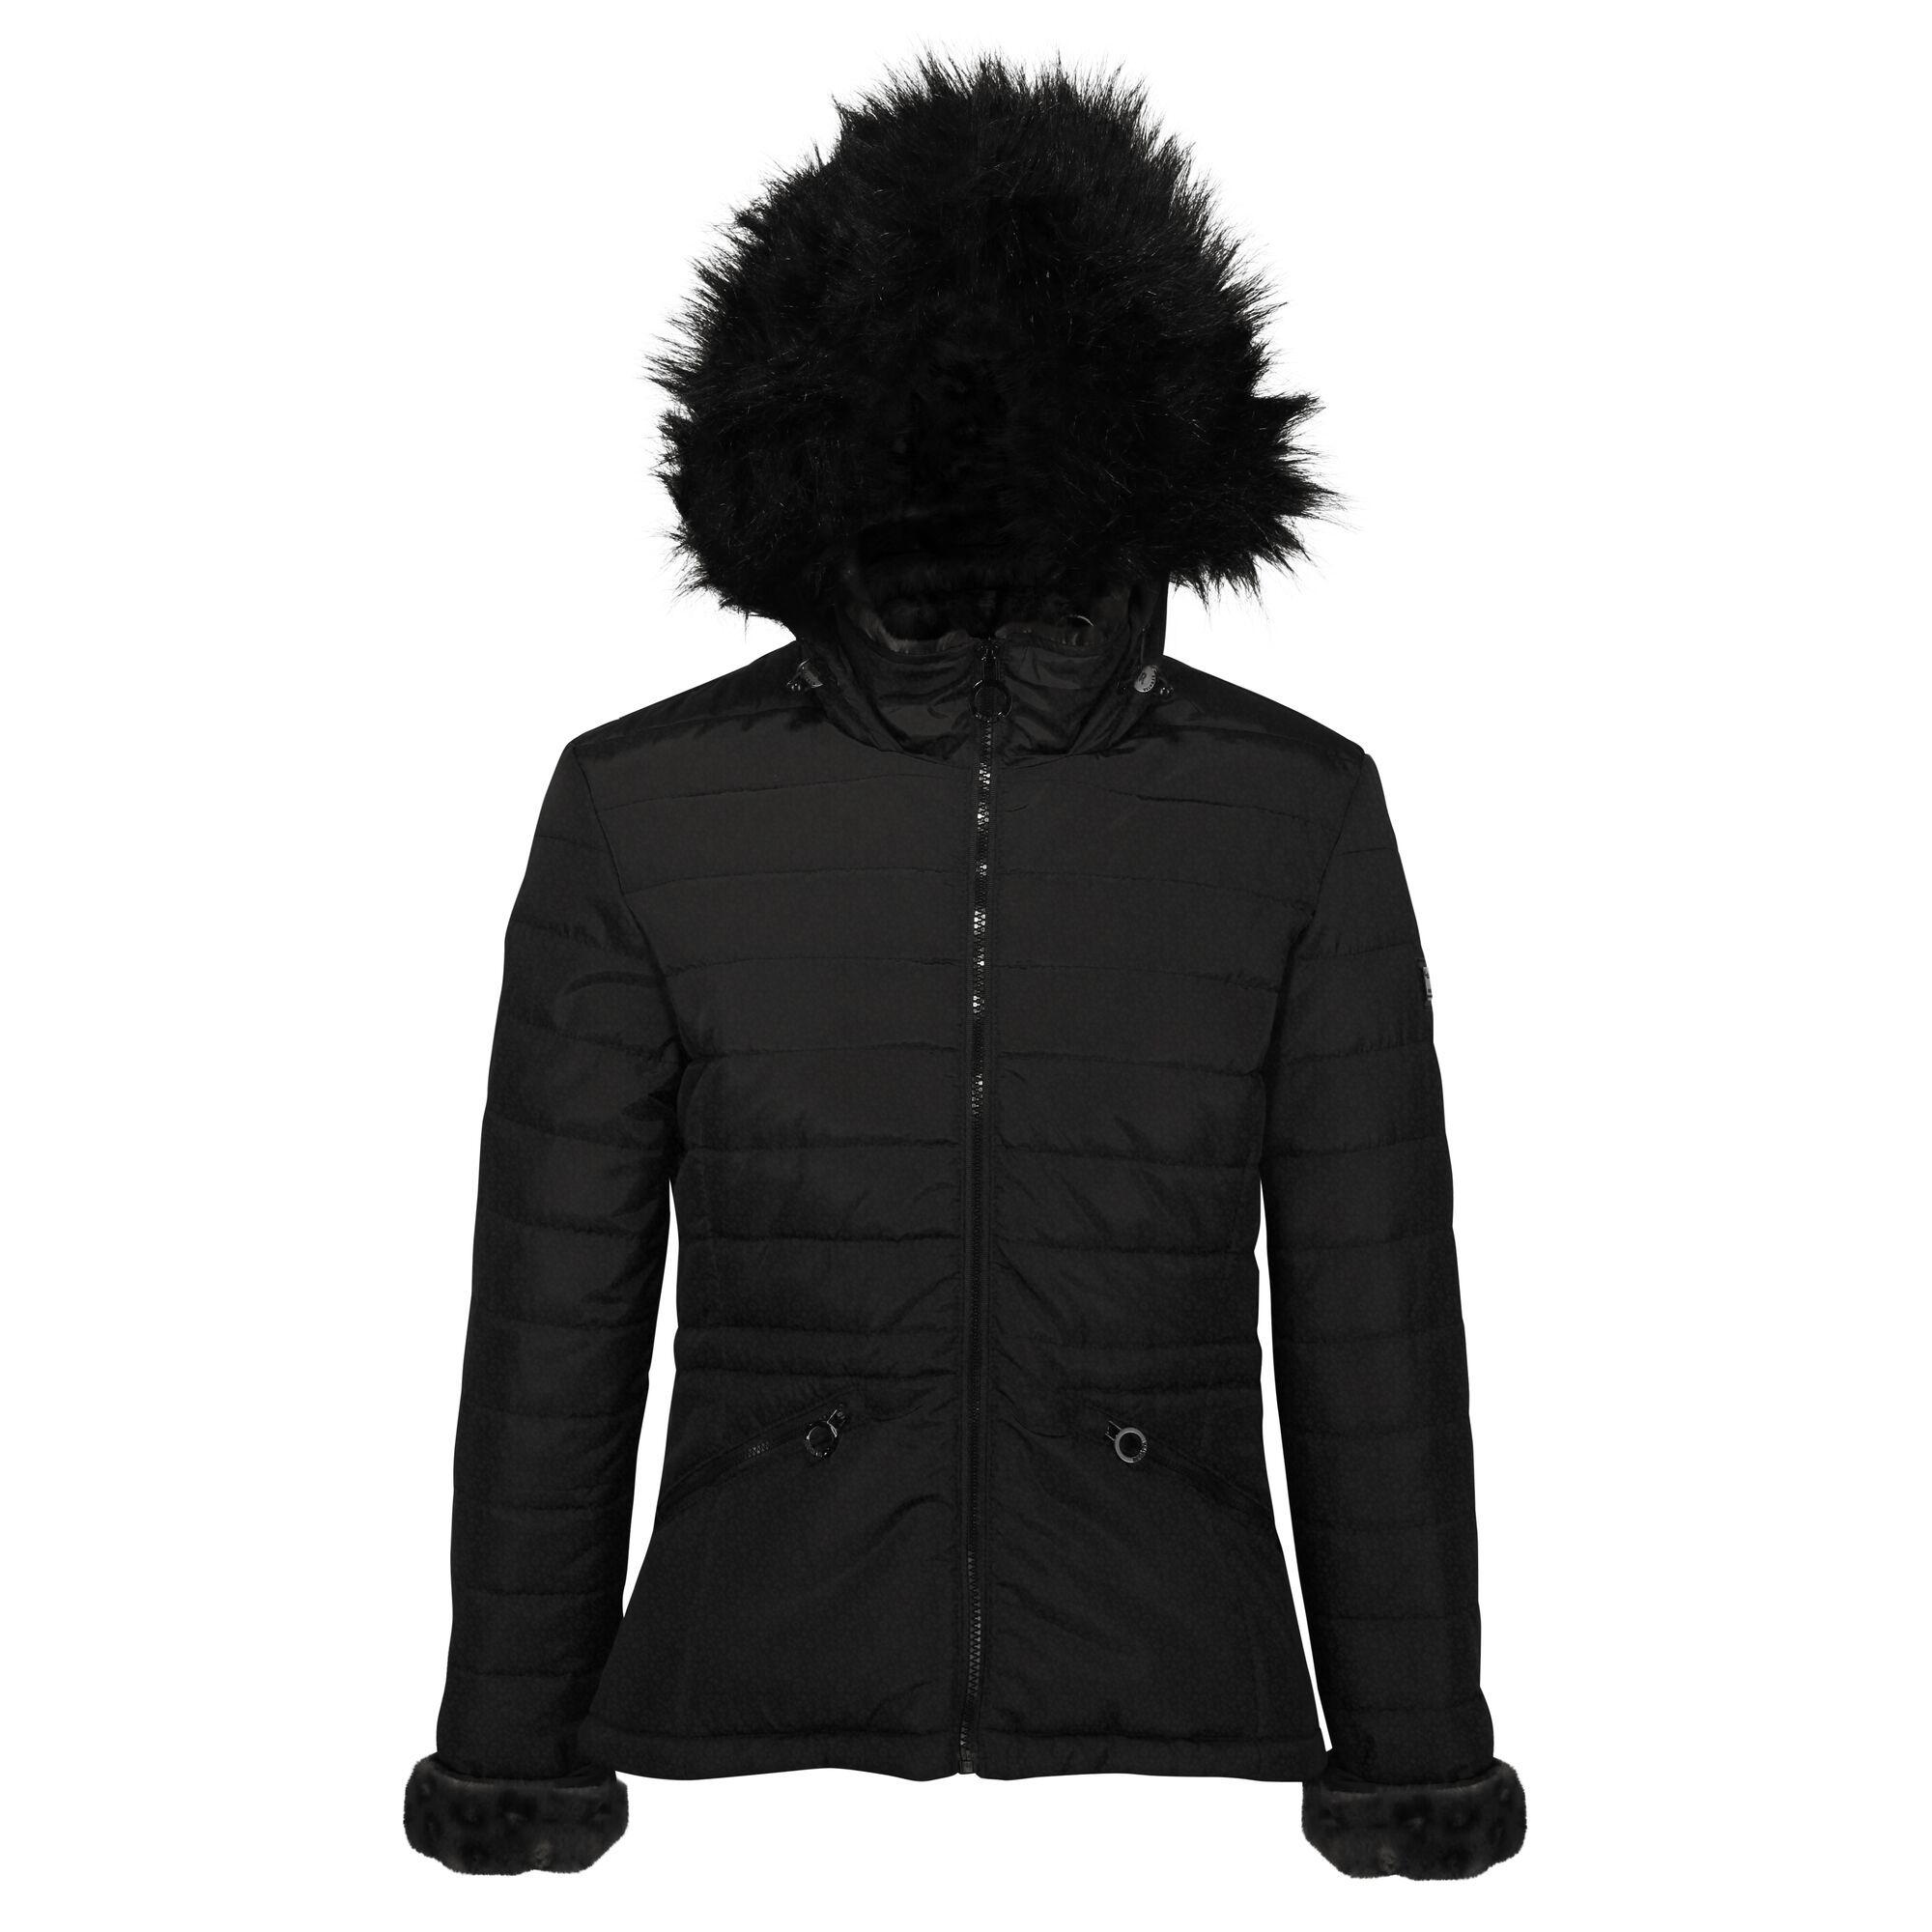 Regatta Womens/Ladies Westlynn Quilted Insulated Jacket (14 UK) (Black)